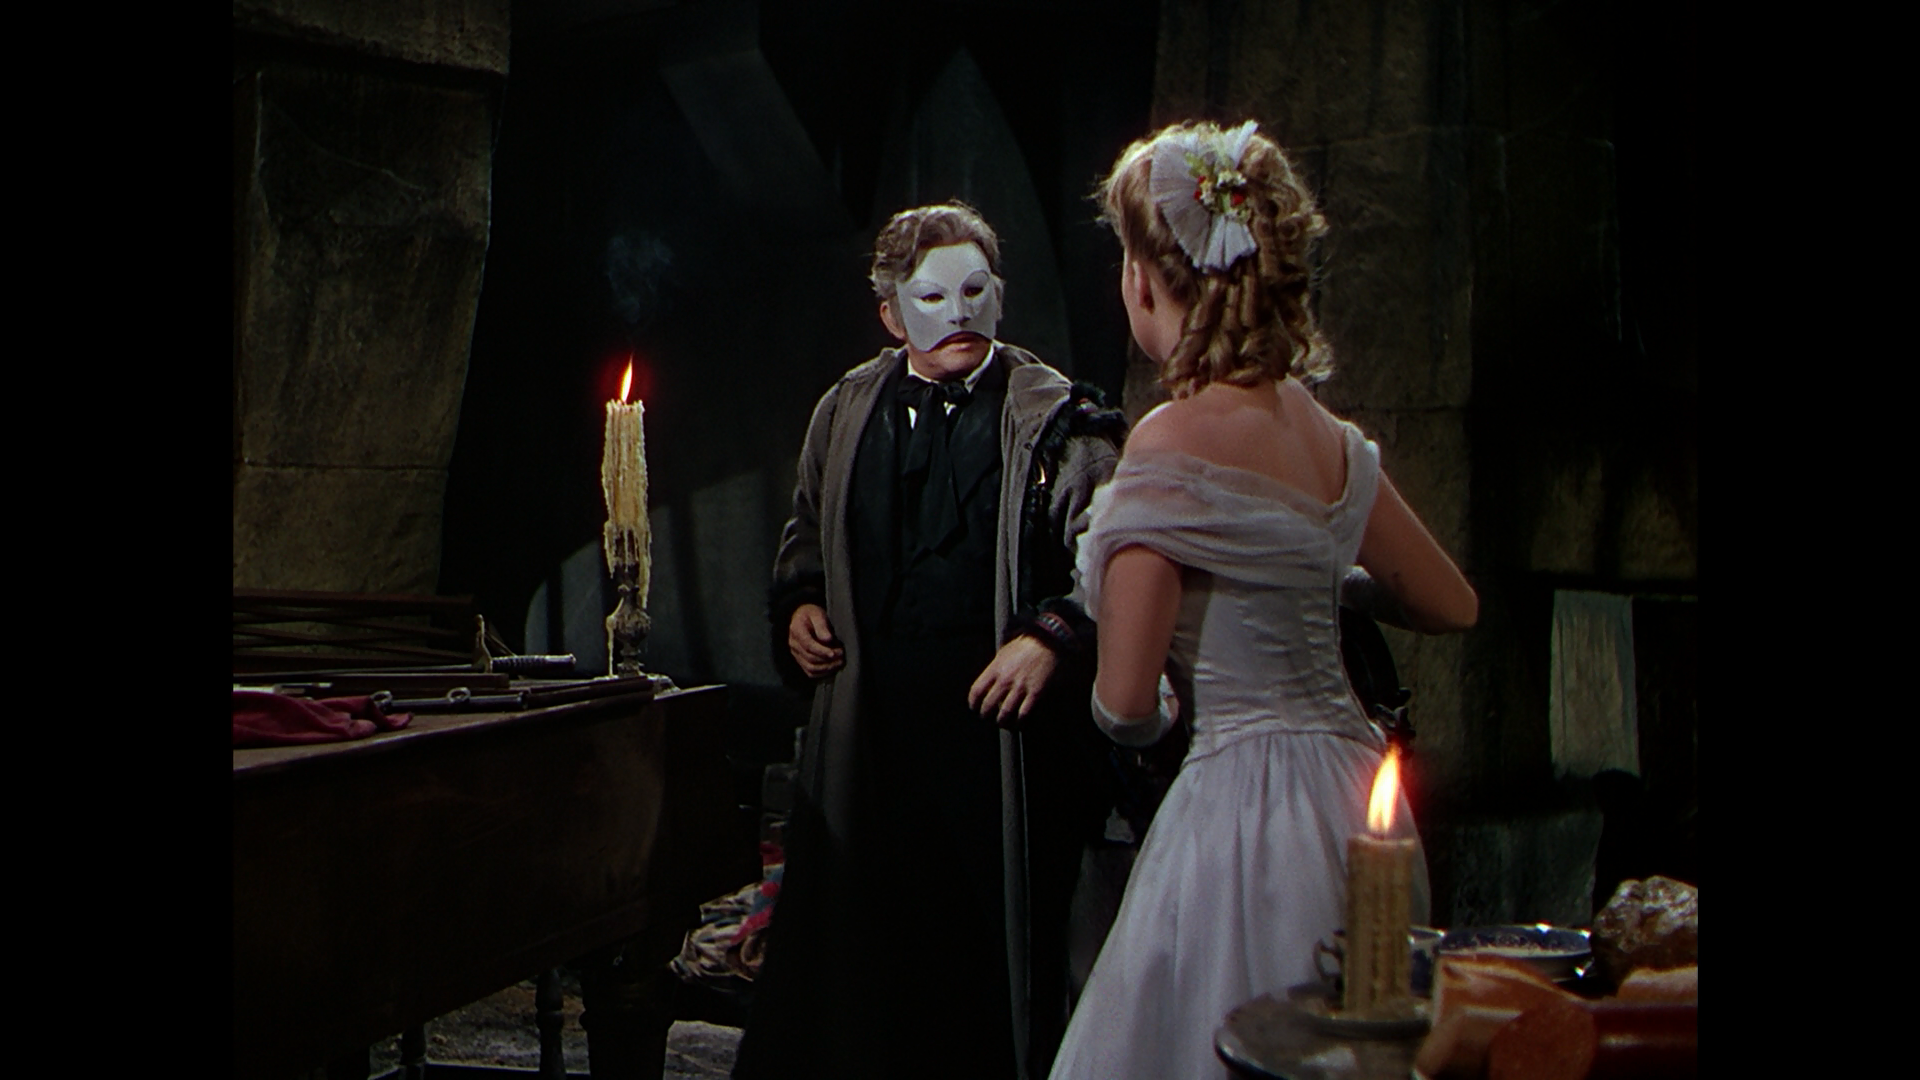 phantom of the opera 1943 ending relationship